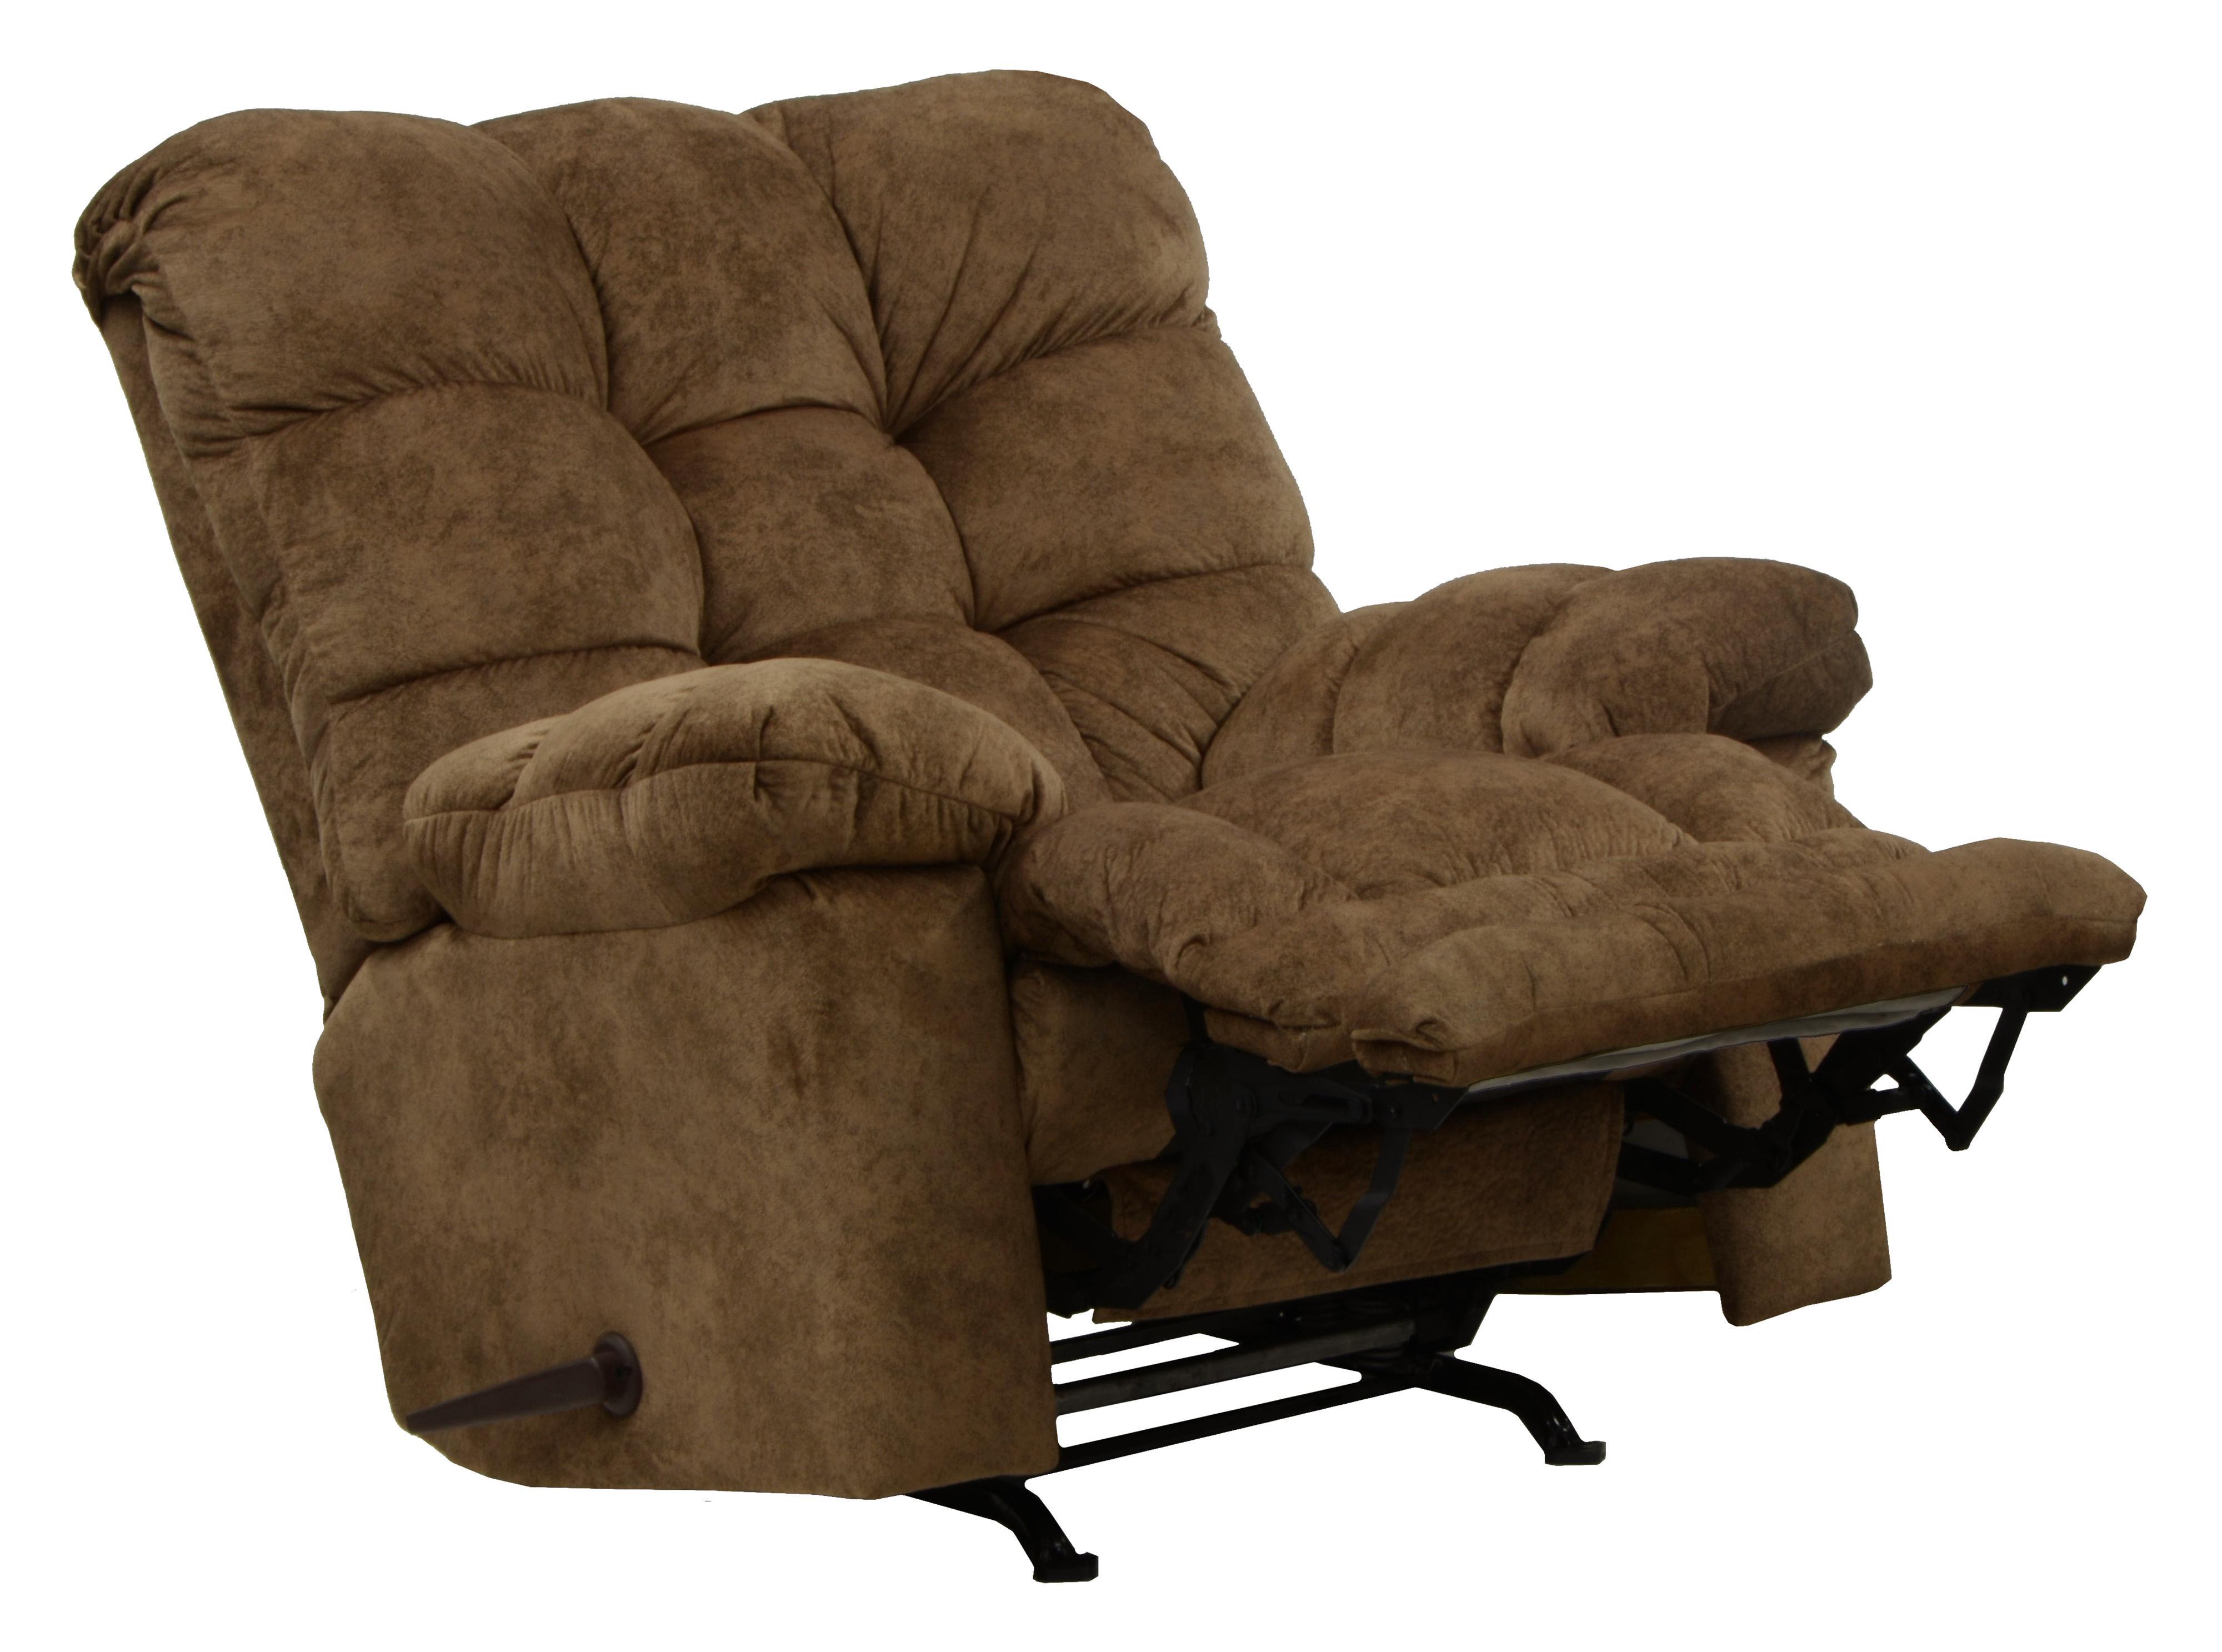 Bronson Rocker Recliner with Extra Comfort